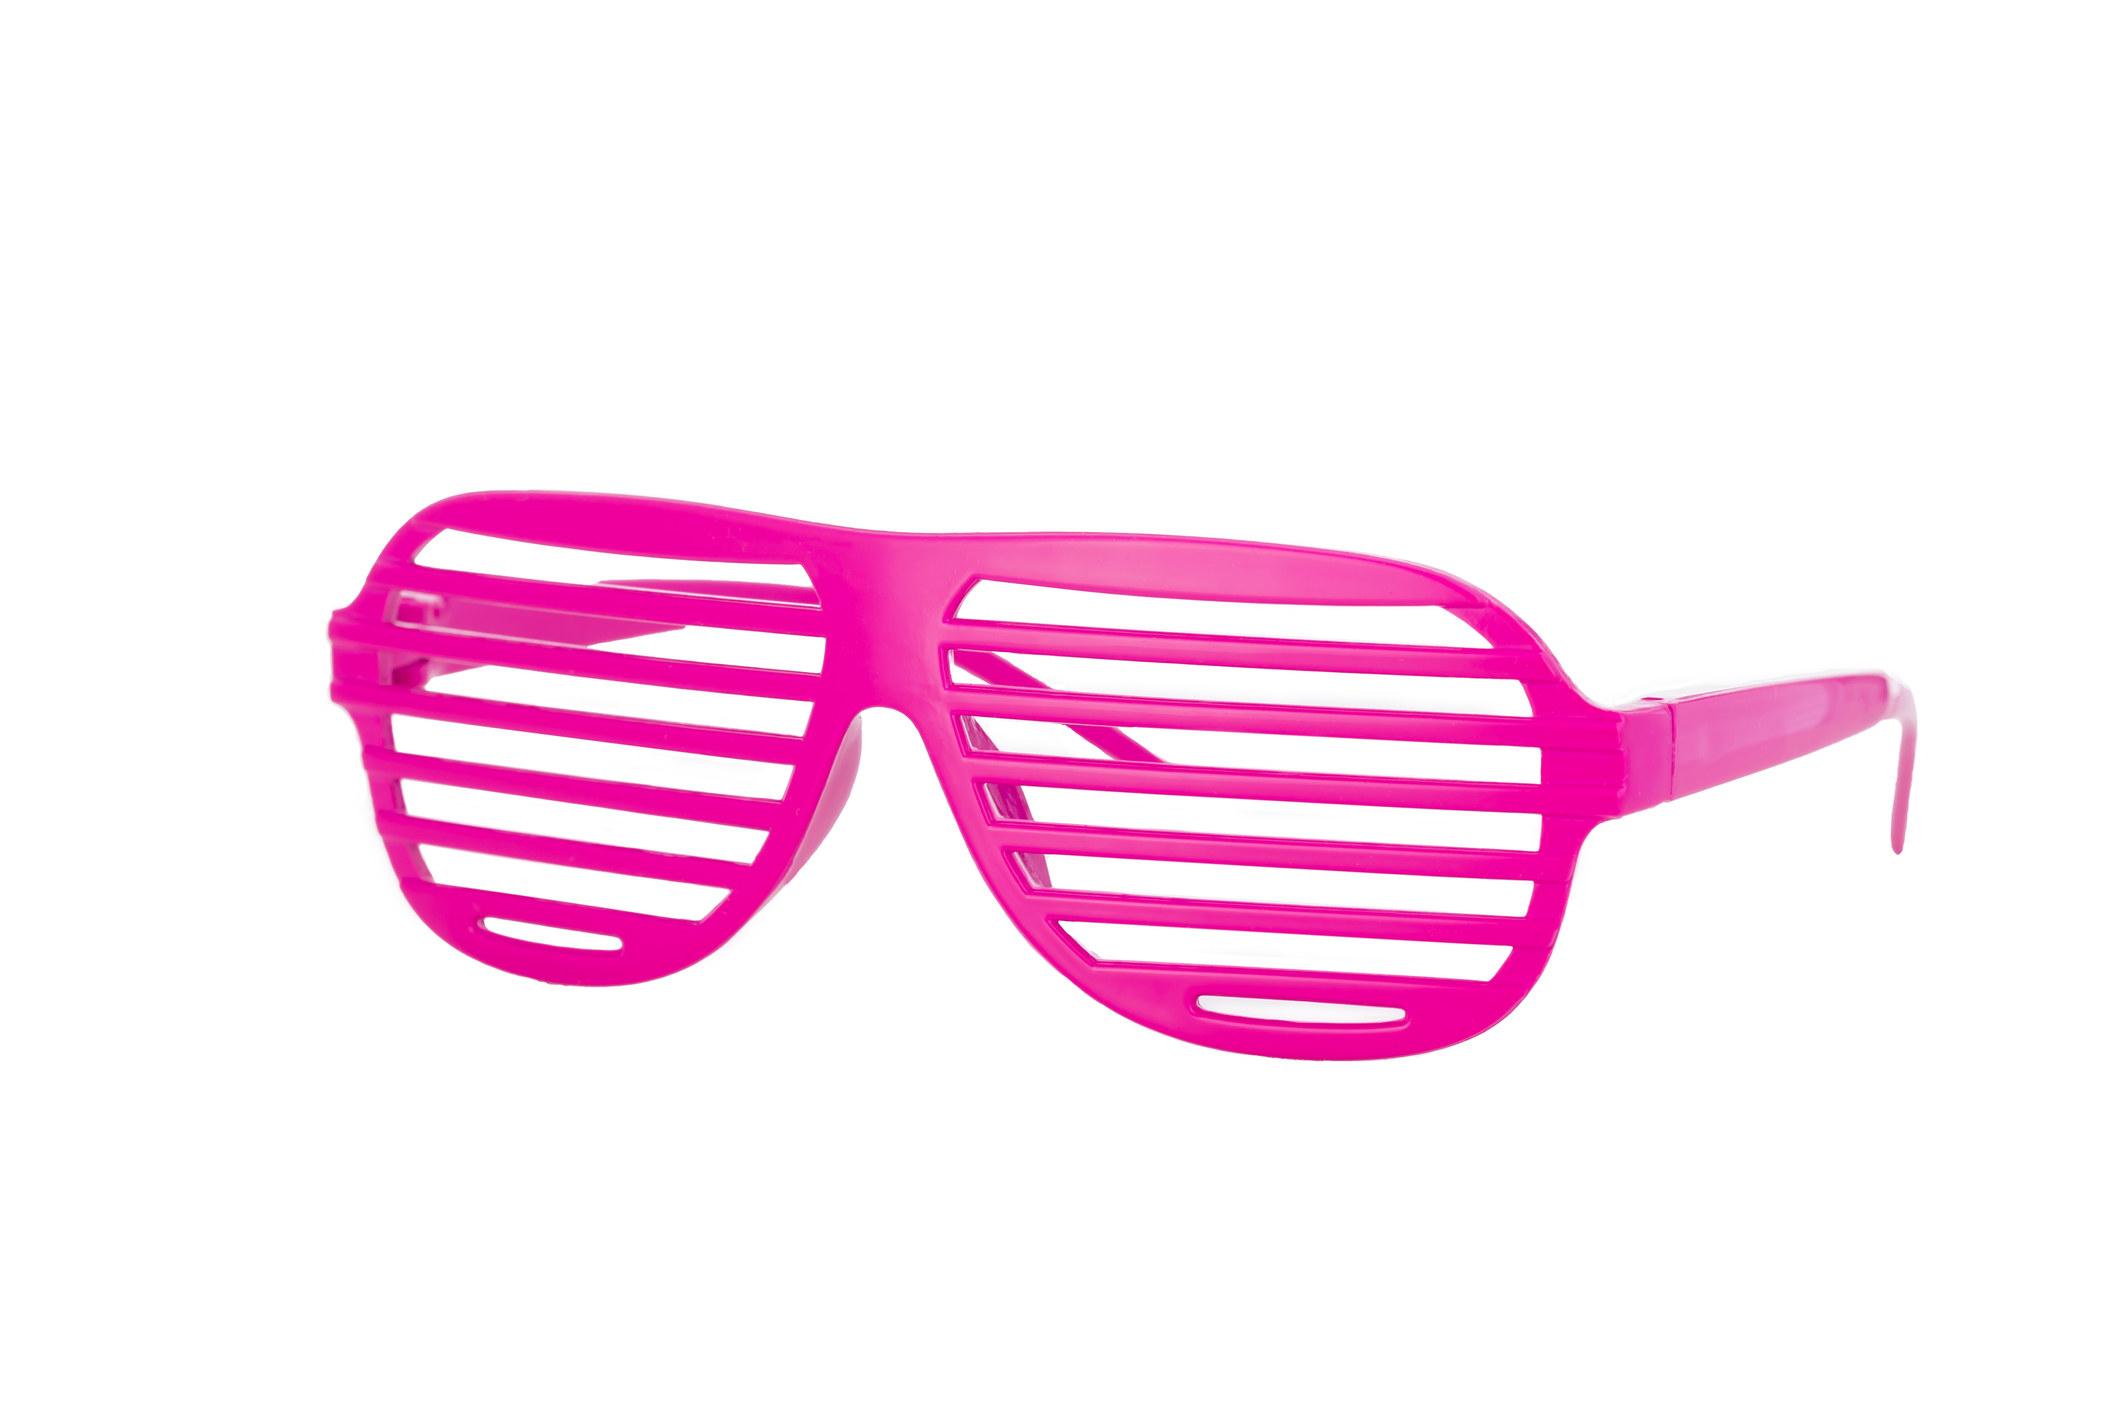 Hot pink shuttershades